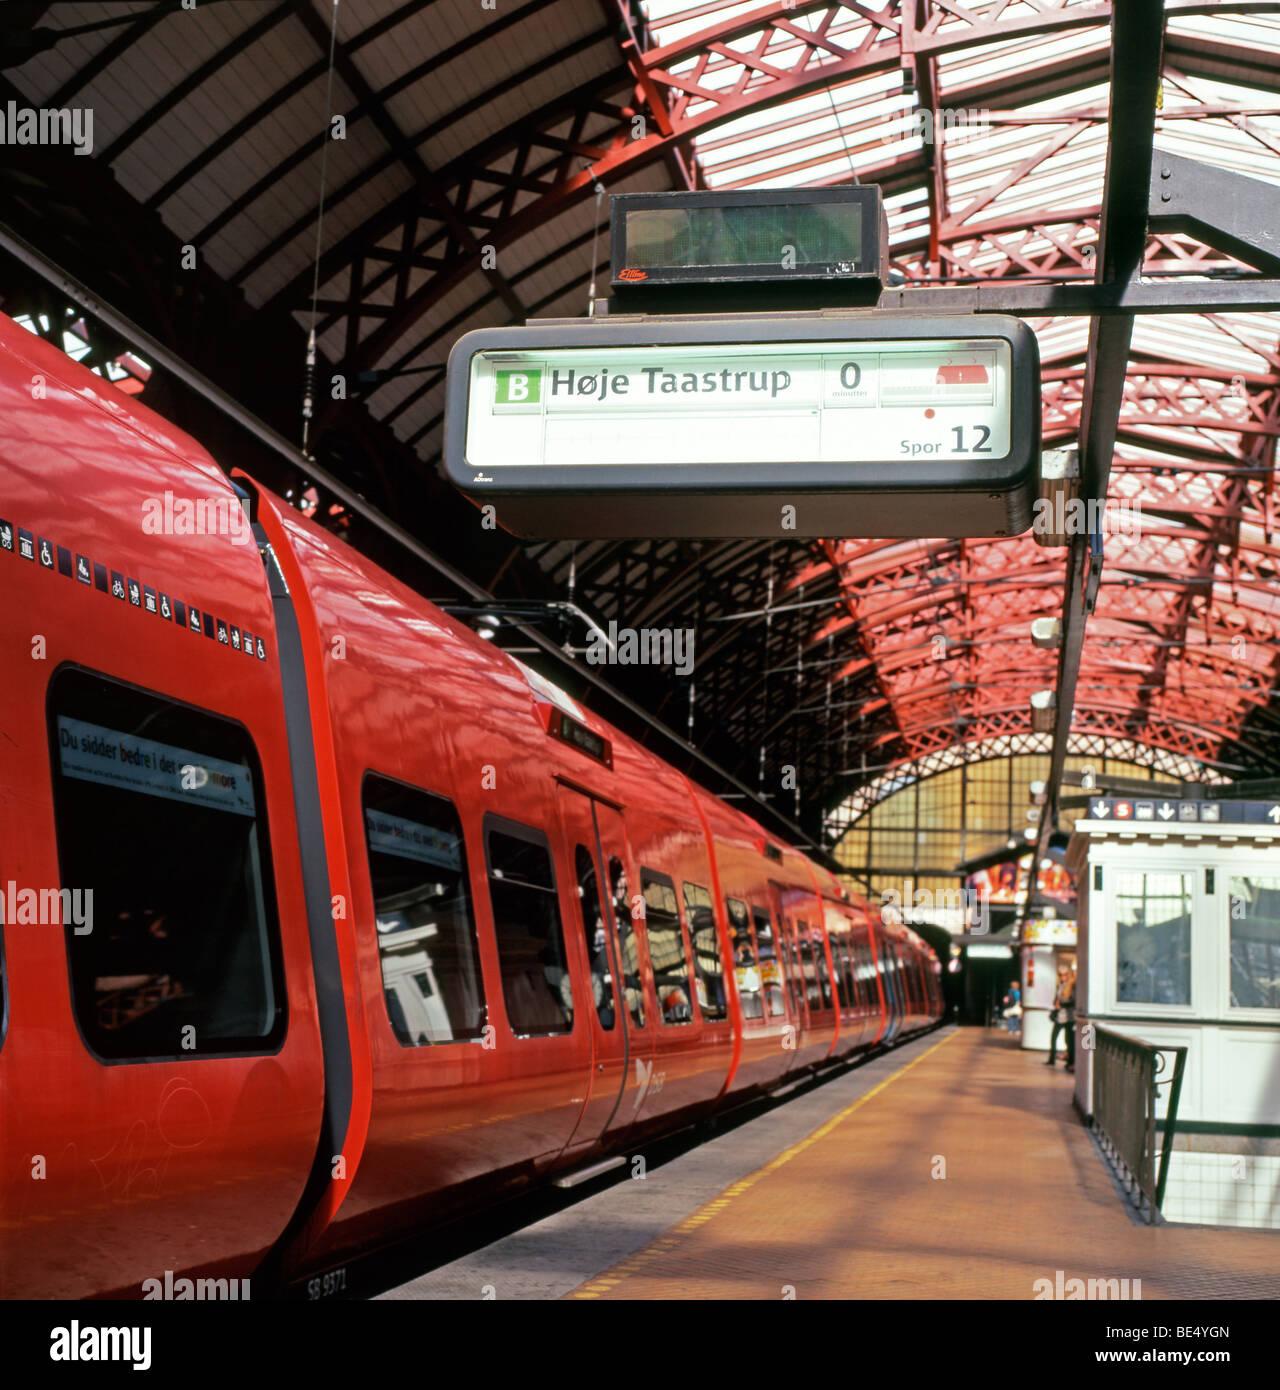 A red train sitting on the platform at Central Station, Kobenhavn H, Hovedbanegarden, Copenhagen Denmark  KATHY - Stock Image